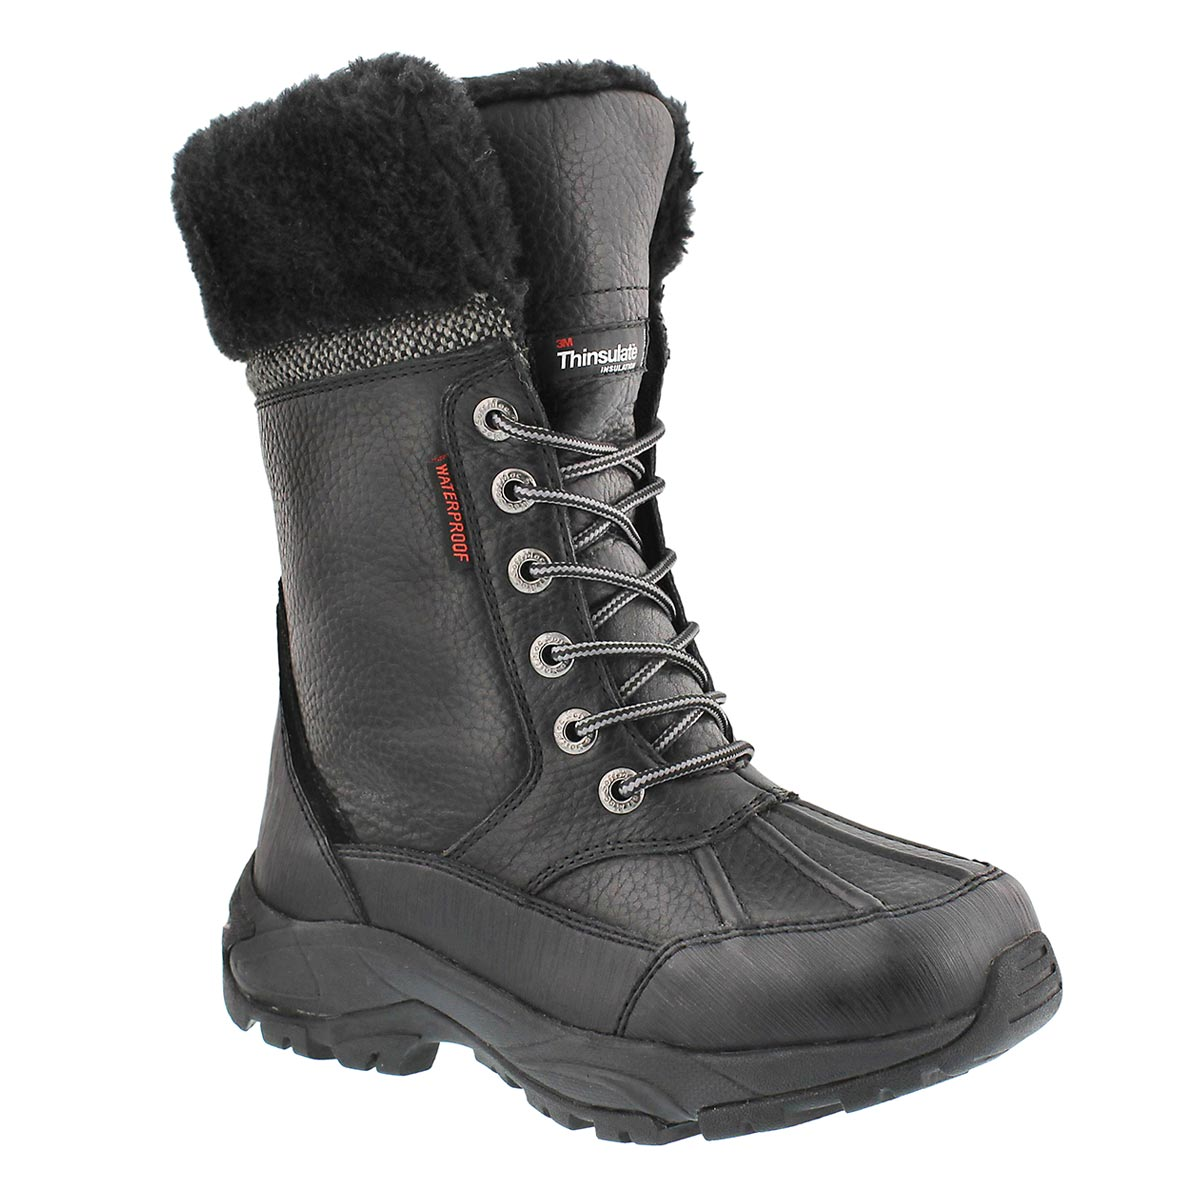 Lds Megan black lace-up wtpf winter boot